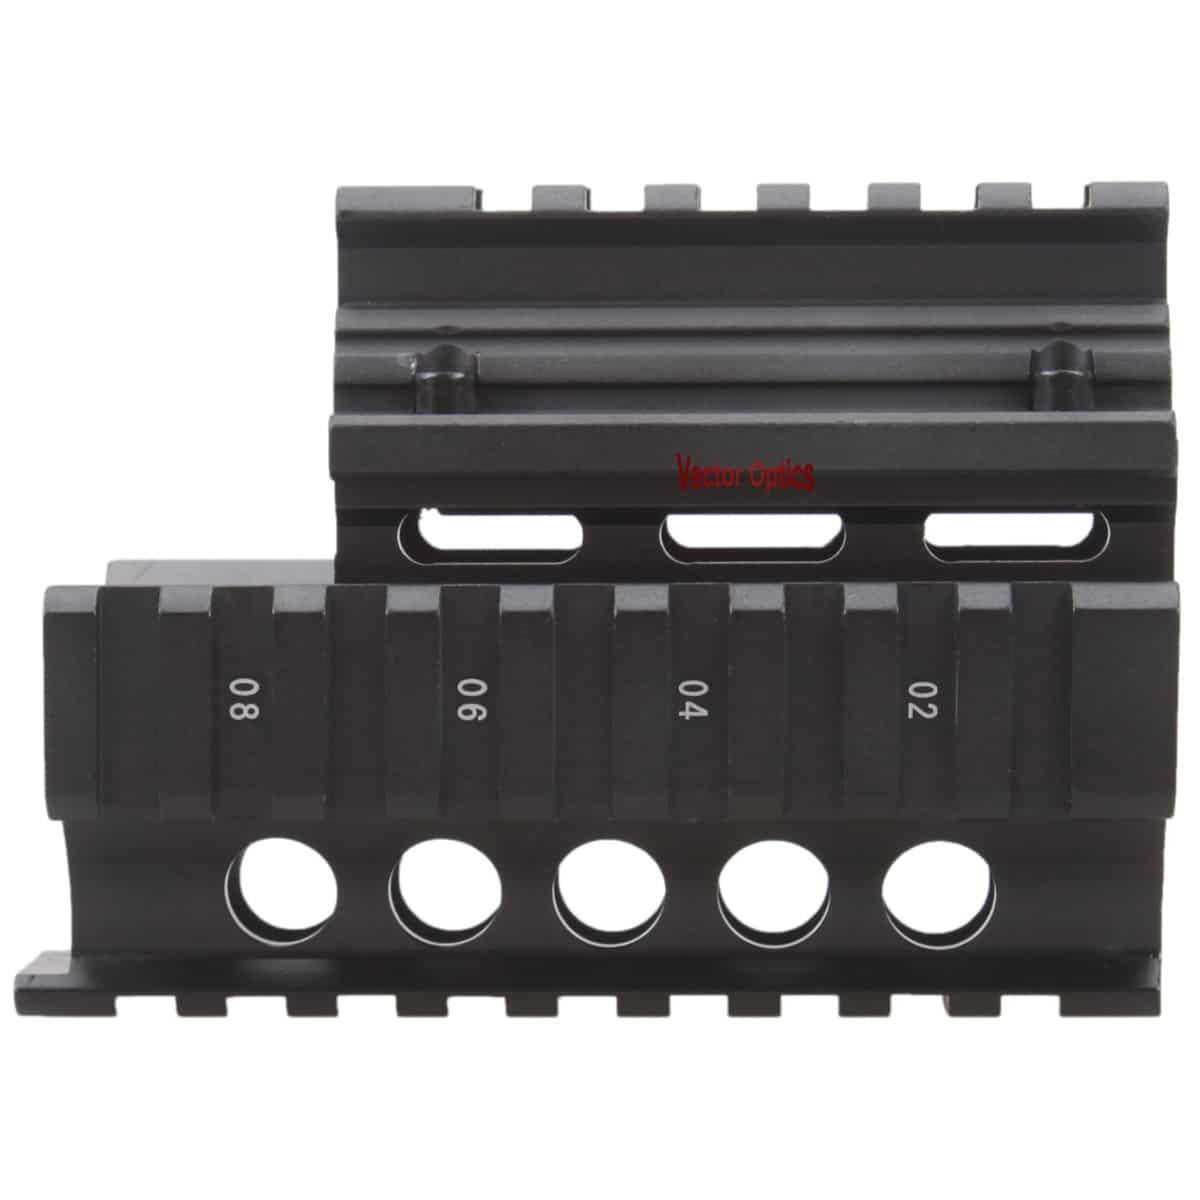 AK Compact Handguard Quad Rail System